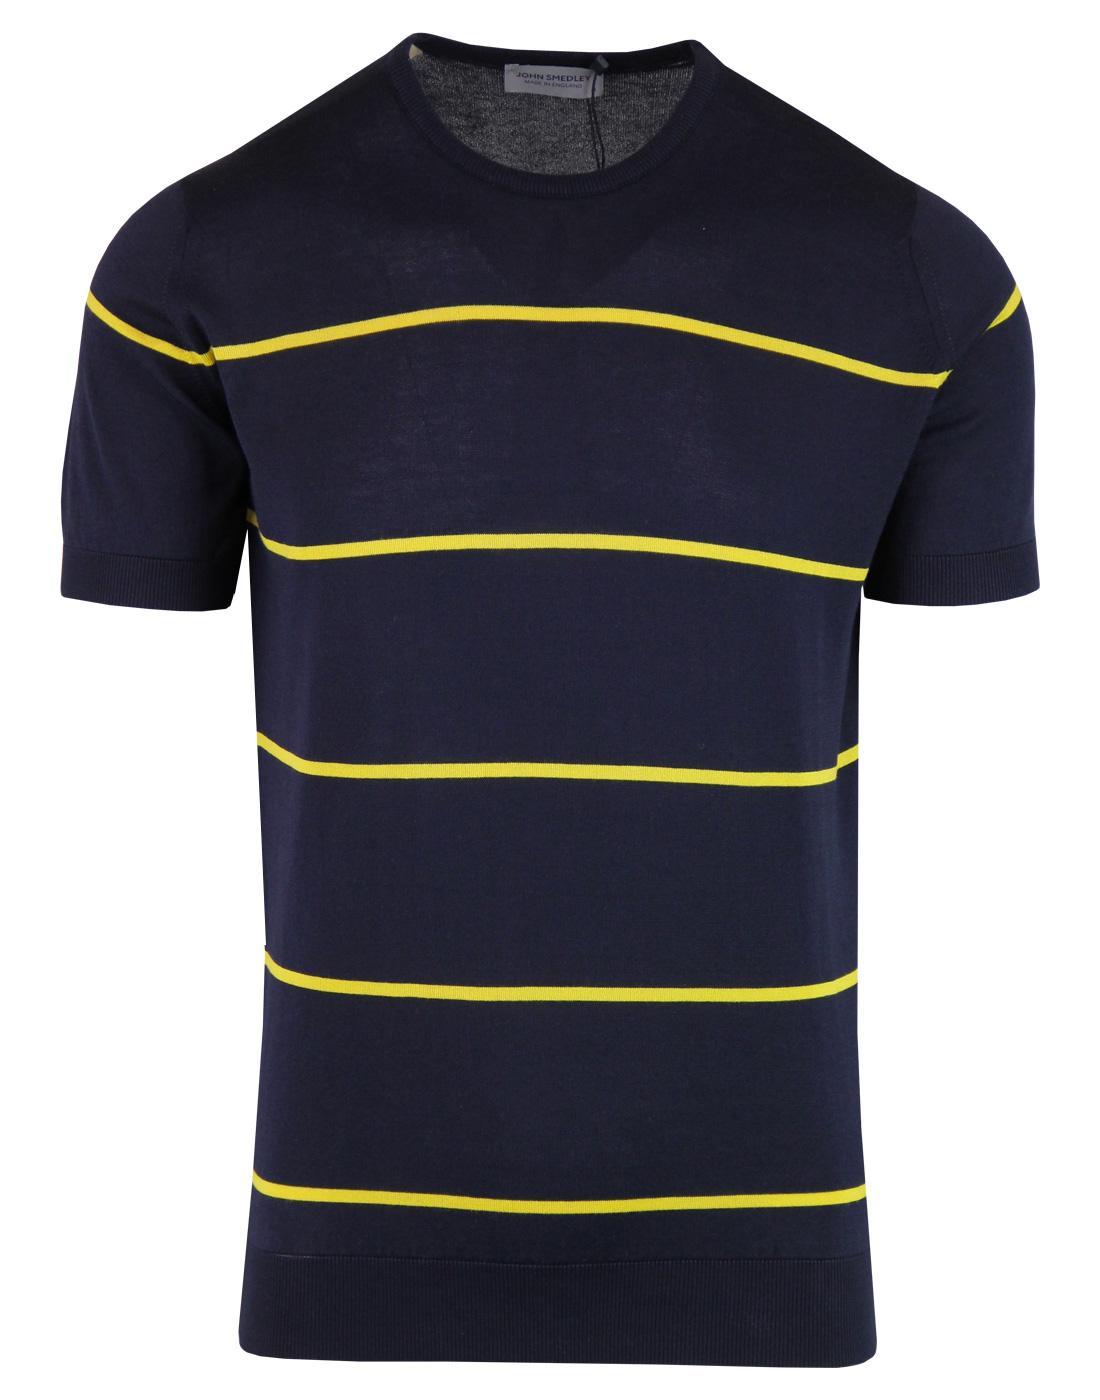 Barlby JOHN SMEDLEY Retro Mod Striped T-shirt (N)